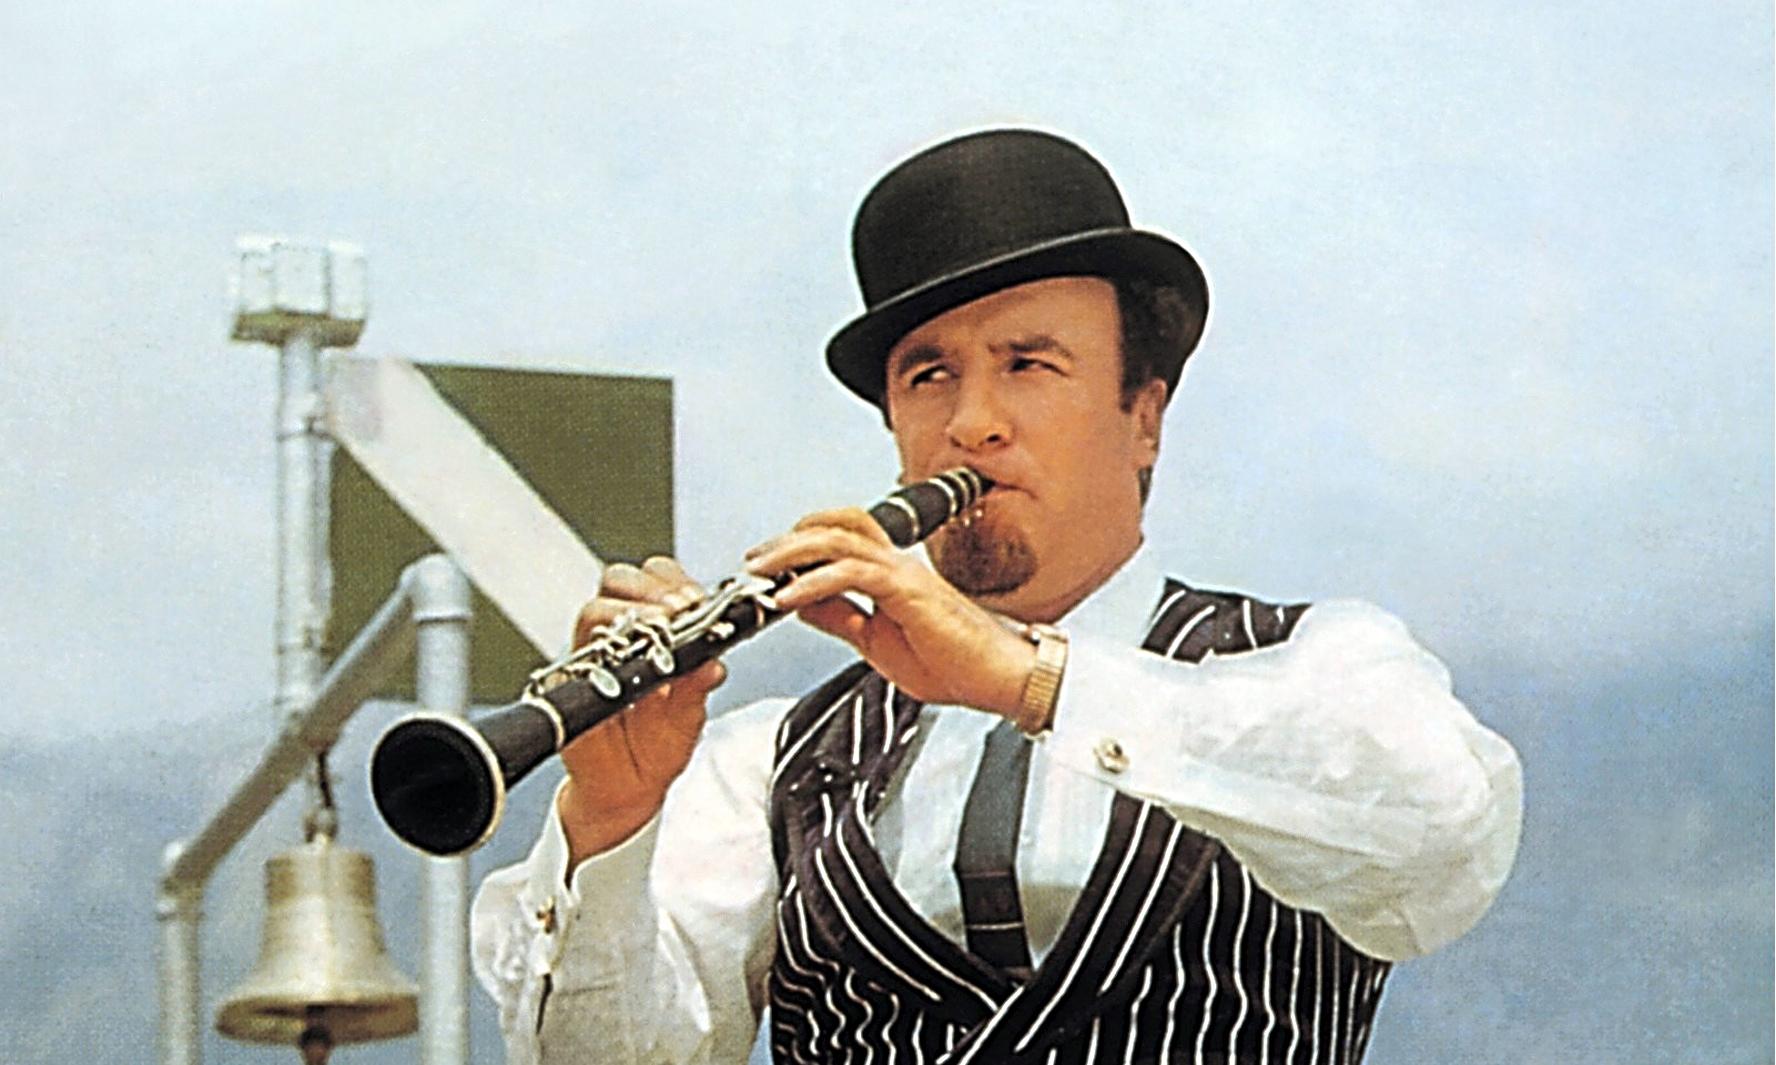 Acker Bilk And His Paramount Jazz Band - The Great Acker Bilk And His Paramount Jazz Band